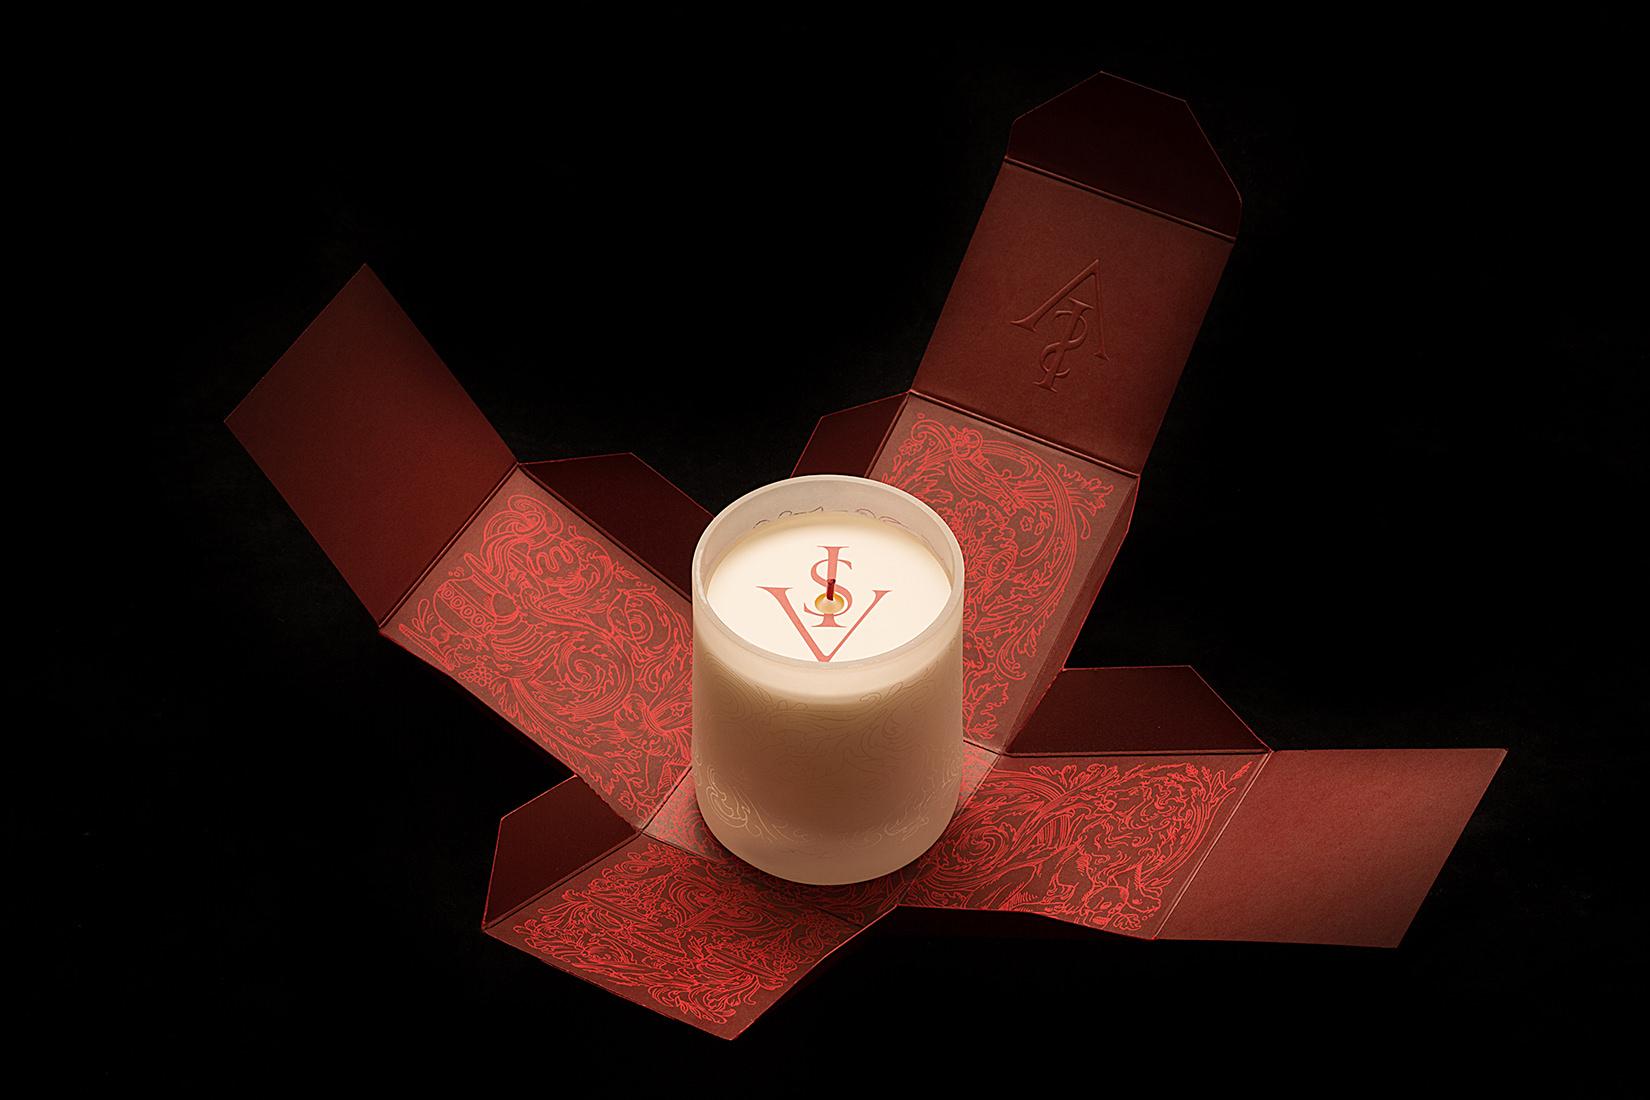 Lvx Candles